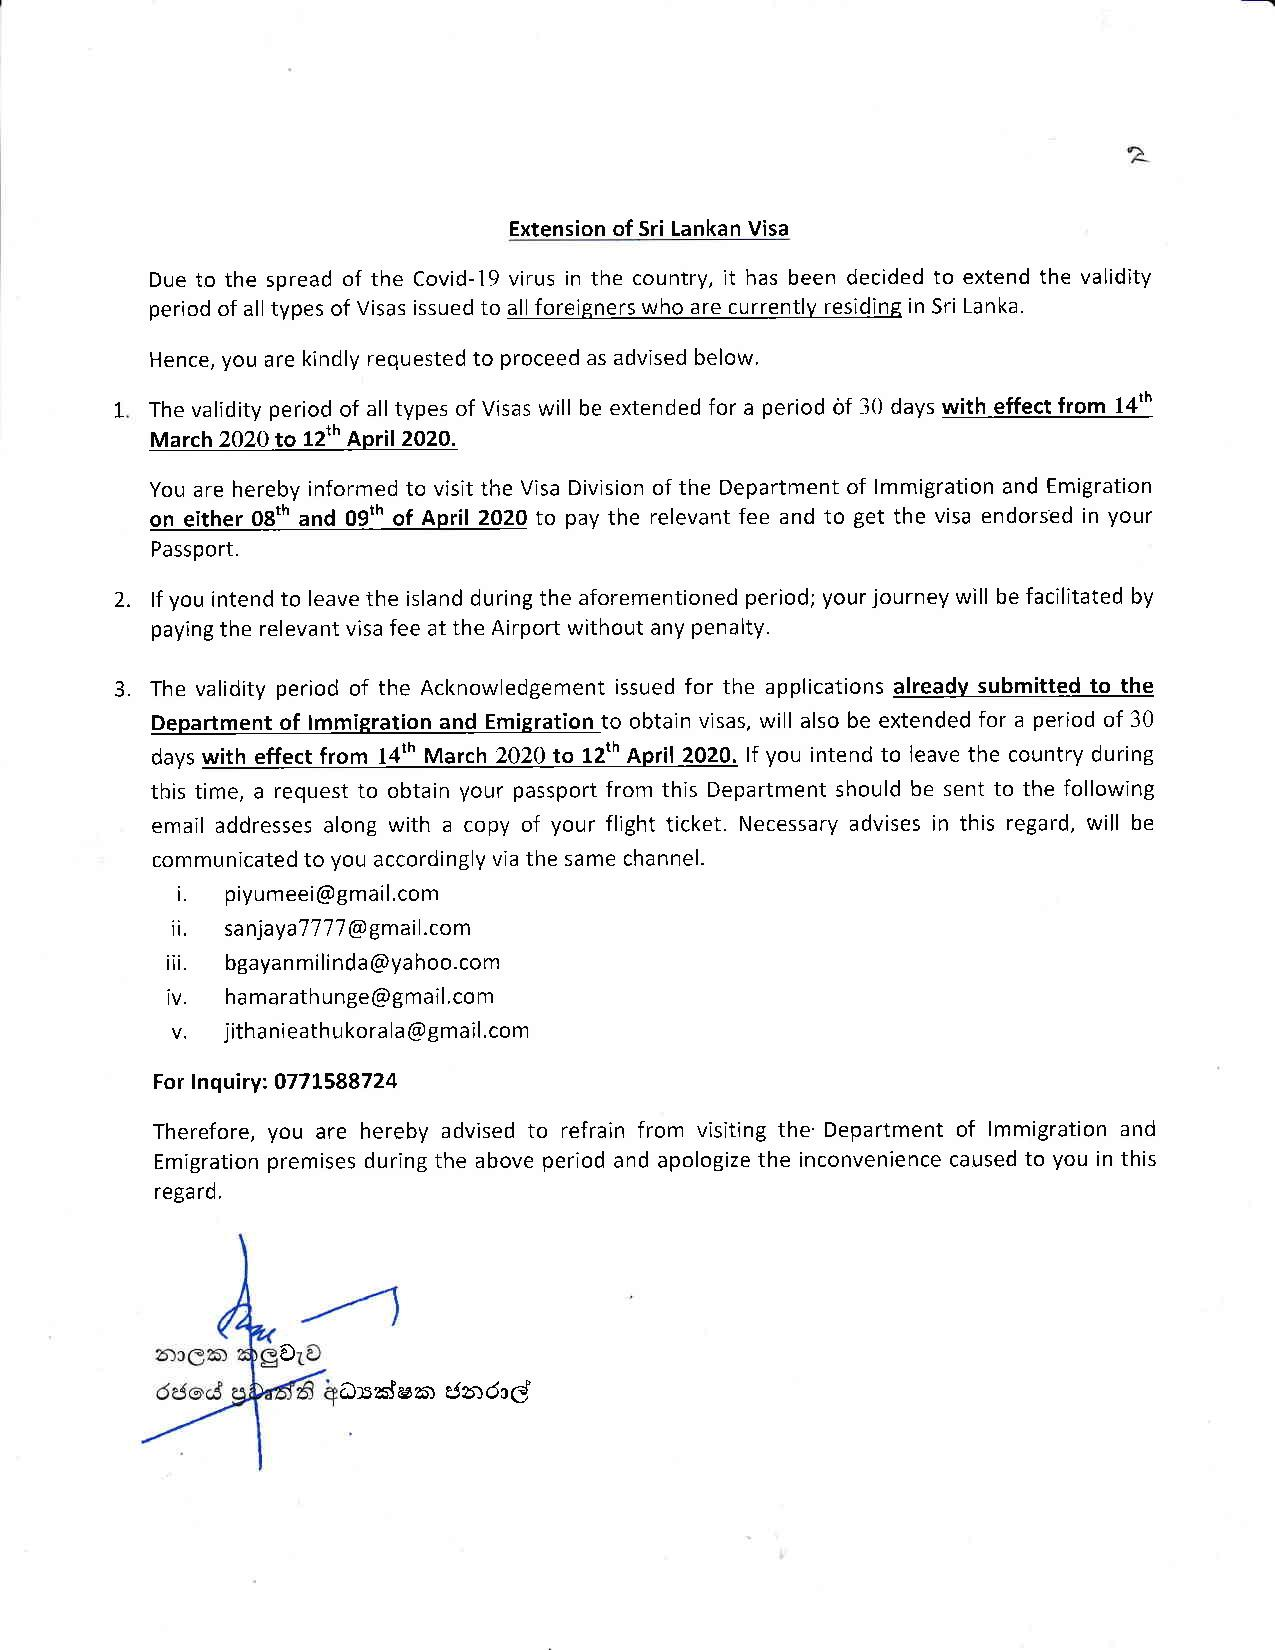 Media Release Extension of Sri Lanka Visa page 002